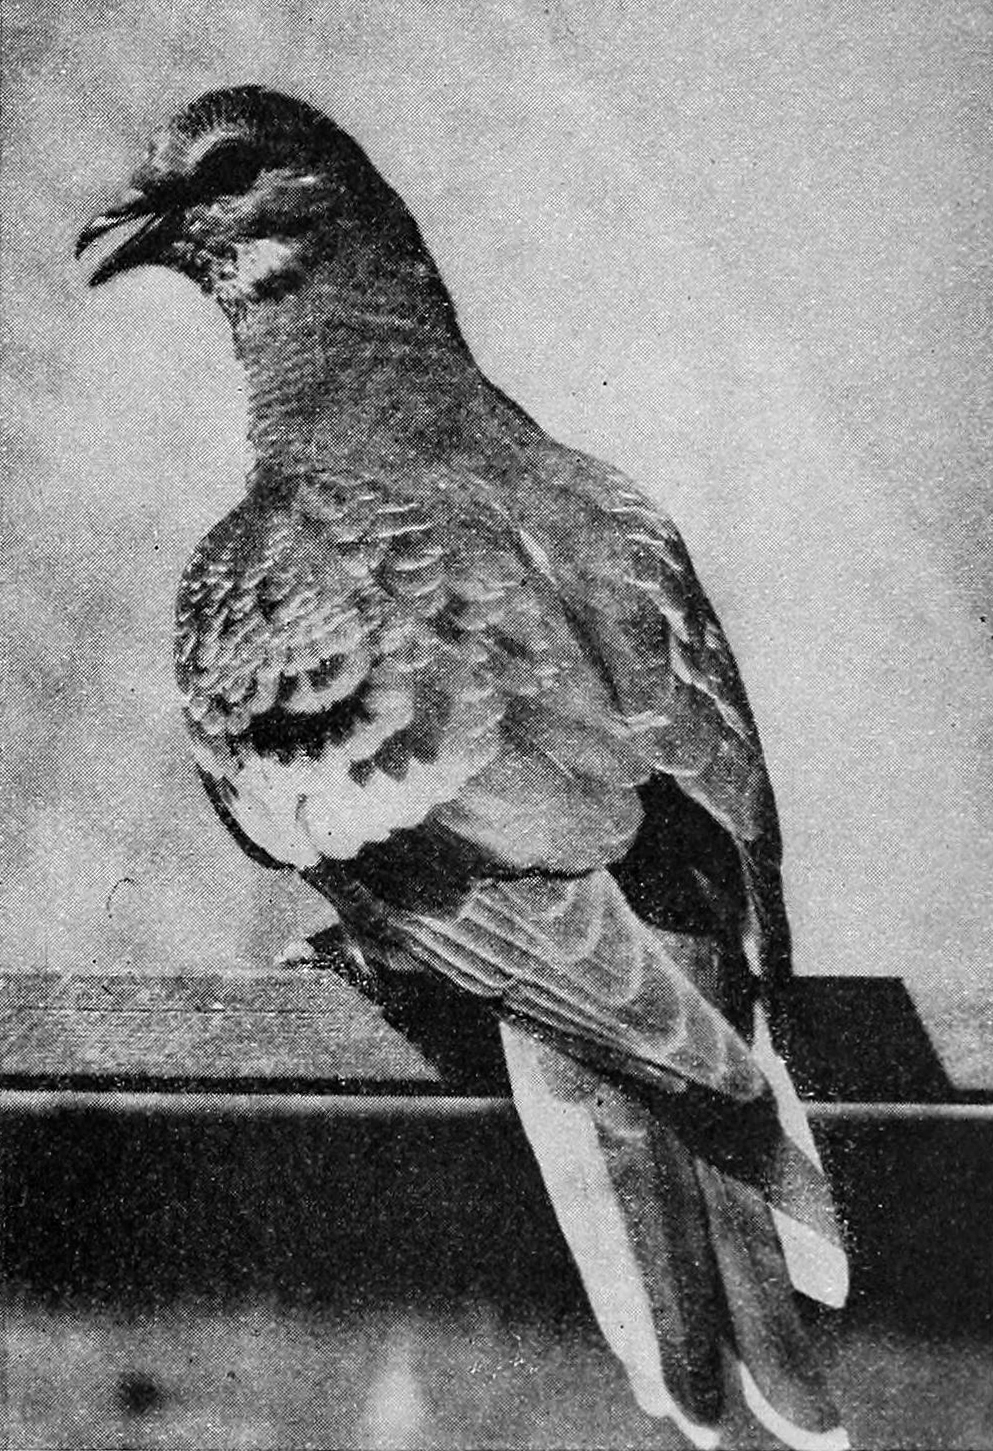 Passenger pigeon.